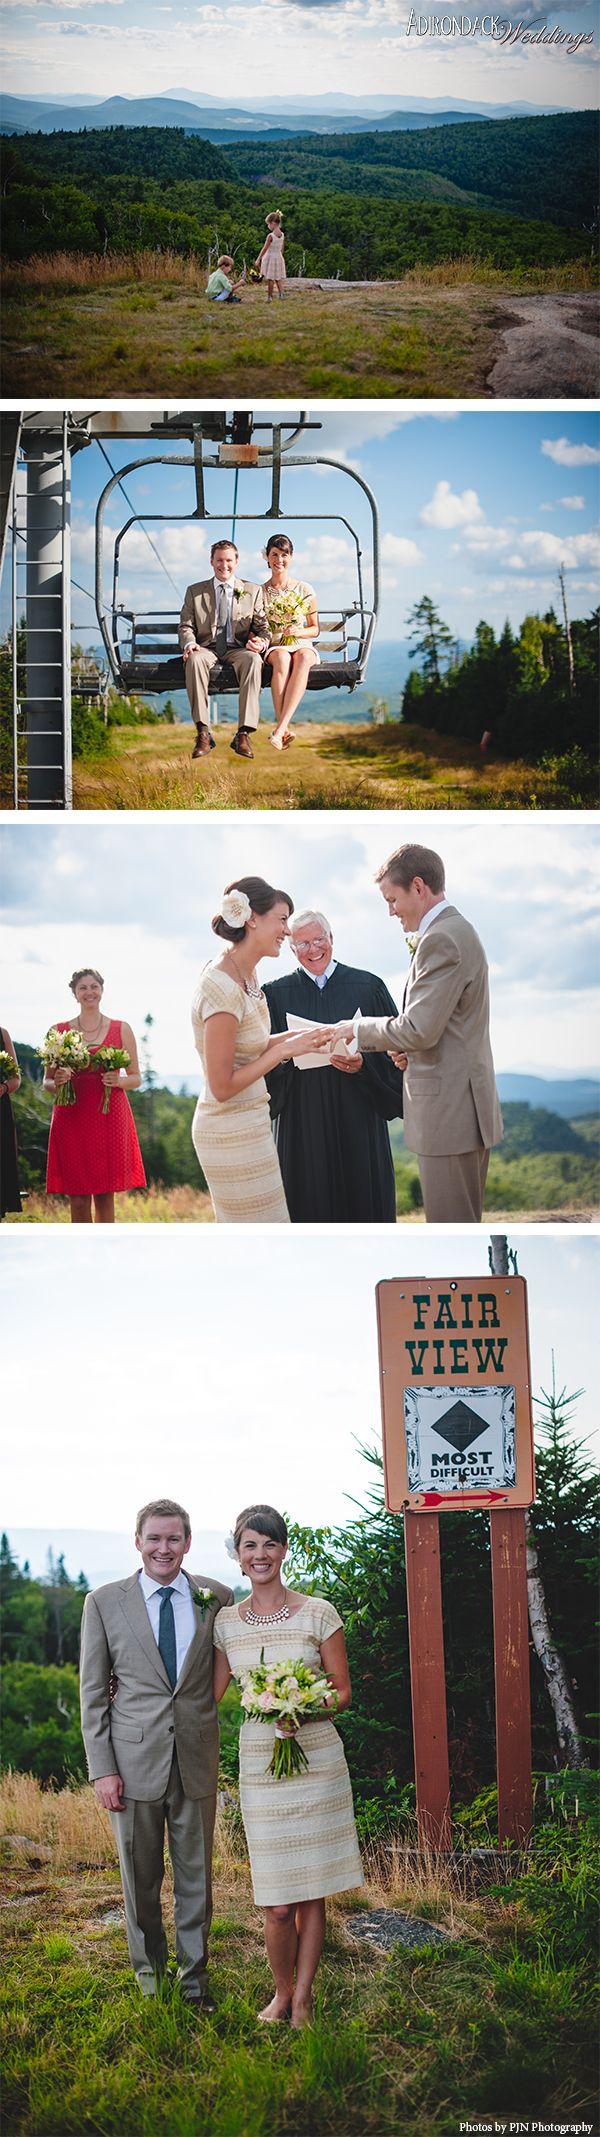 Gore Mountain | Adirondack Weddings Magazine